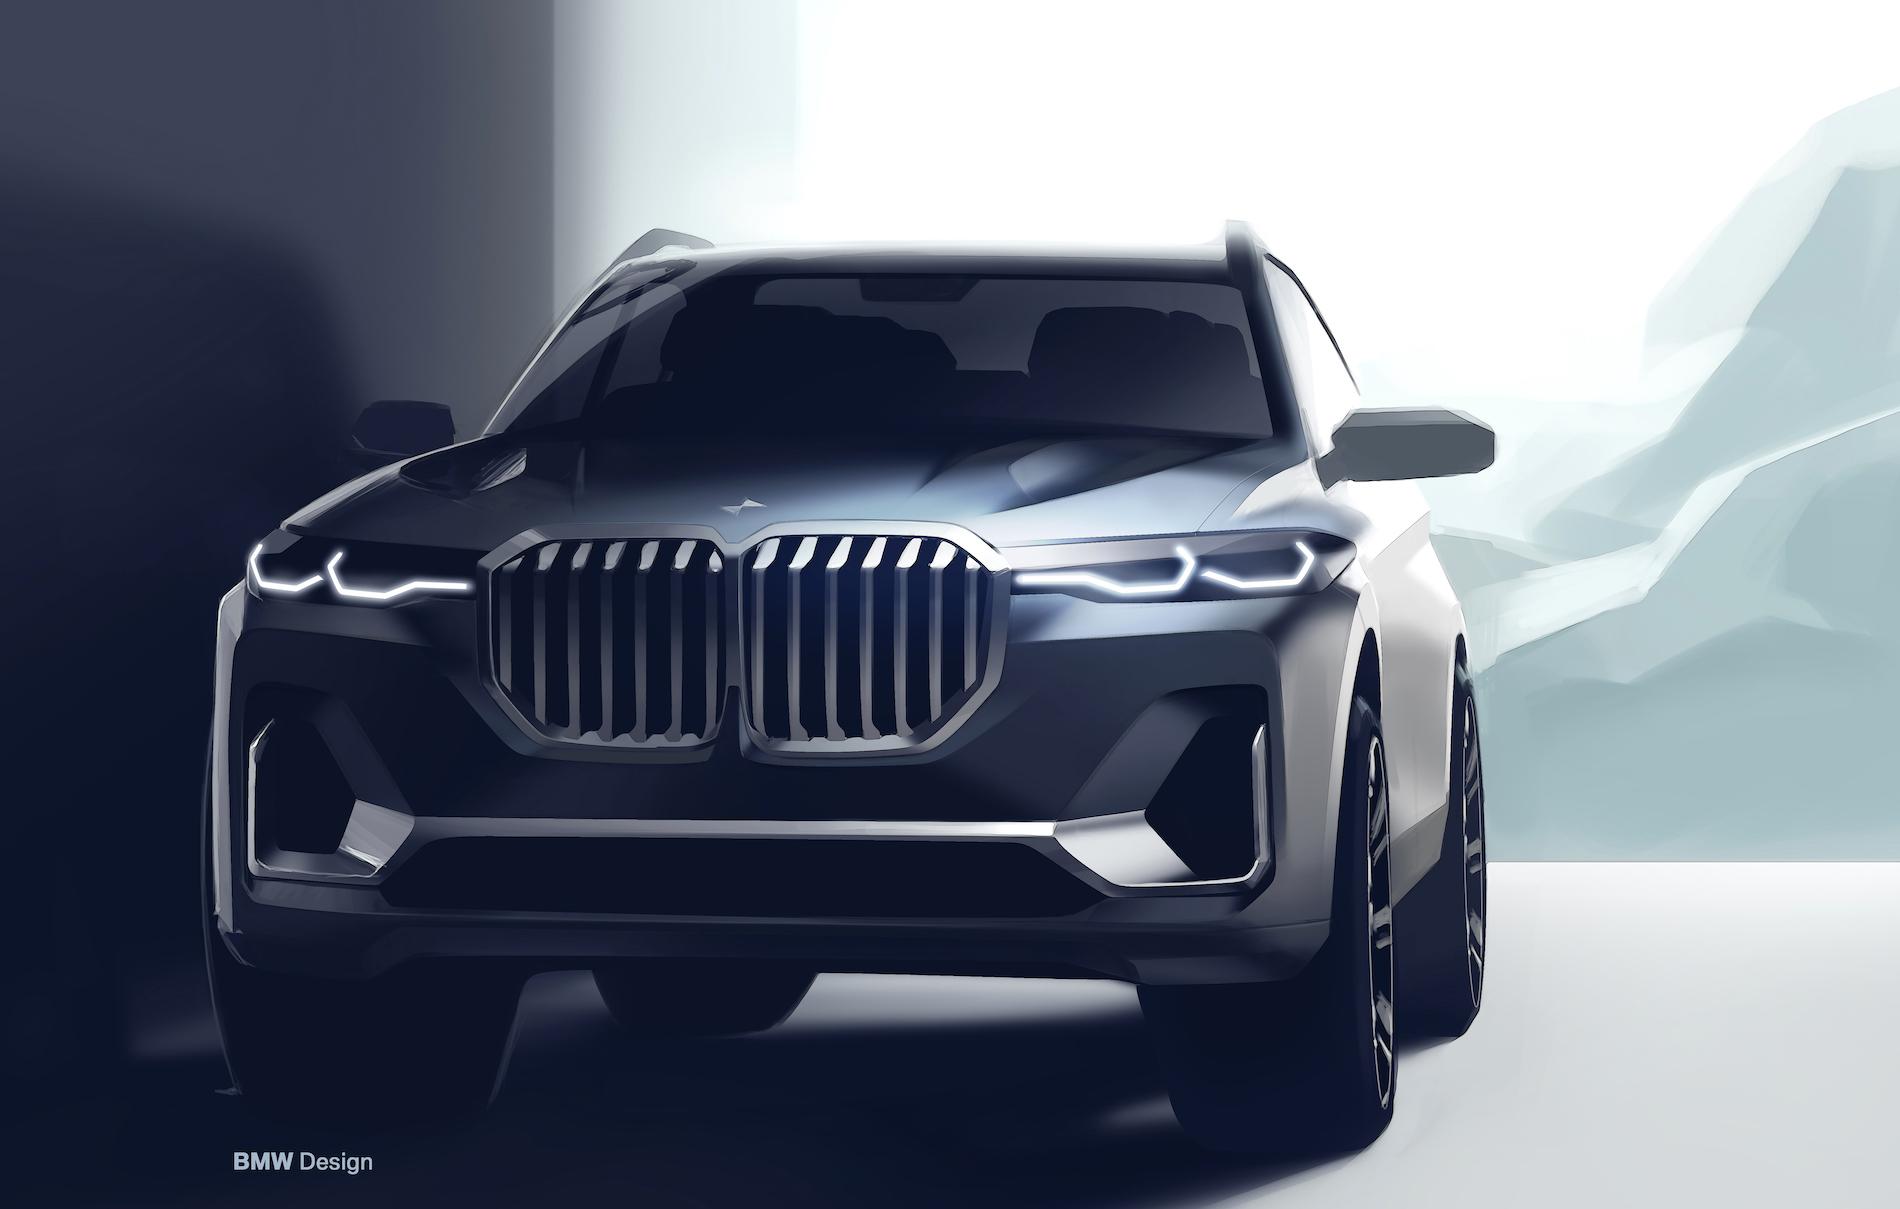 BMW X7 sketches 3